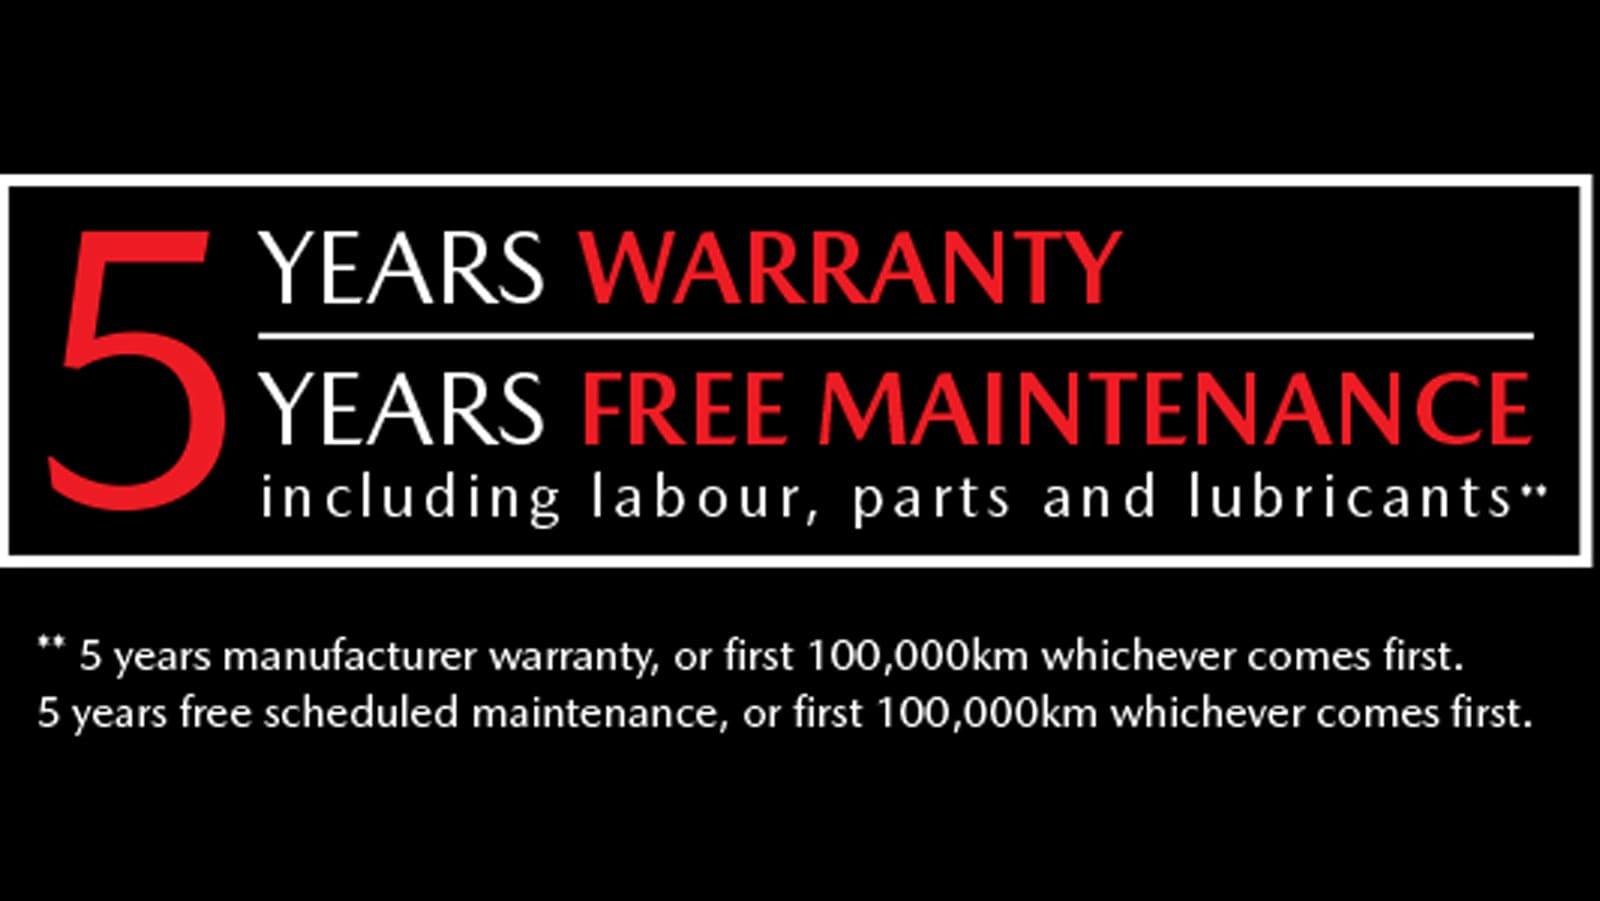 2020 Mazda Free Service Malaysia